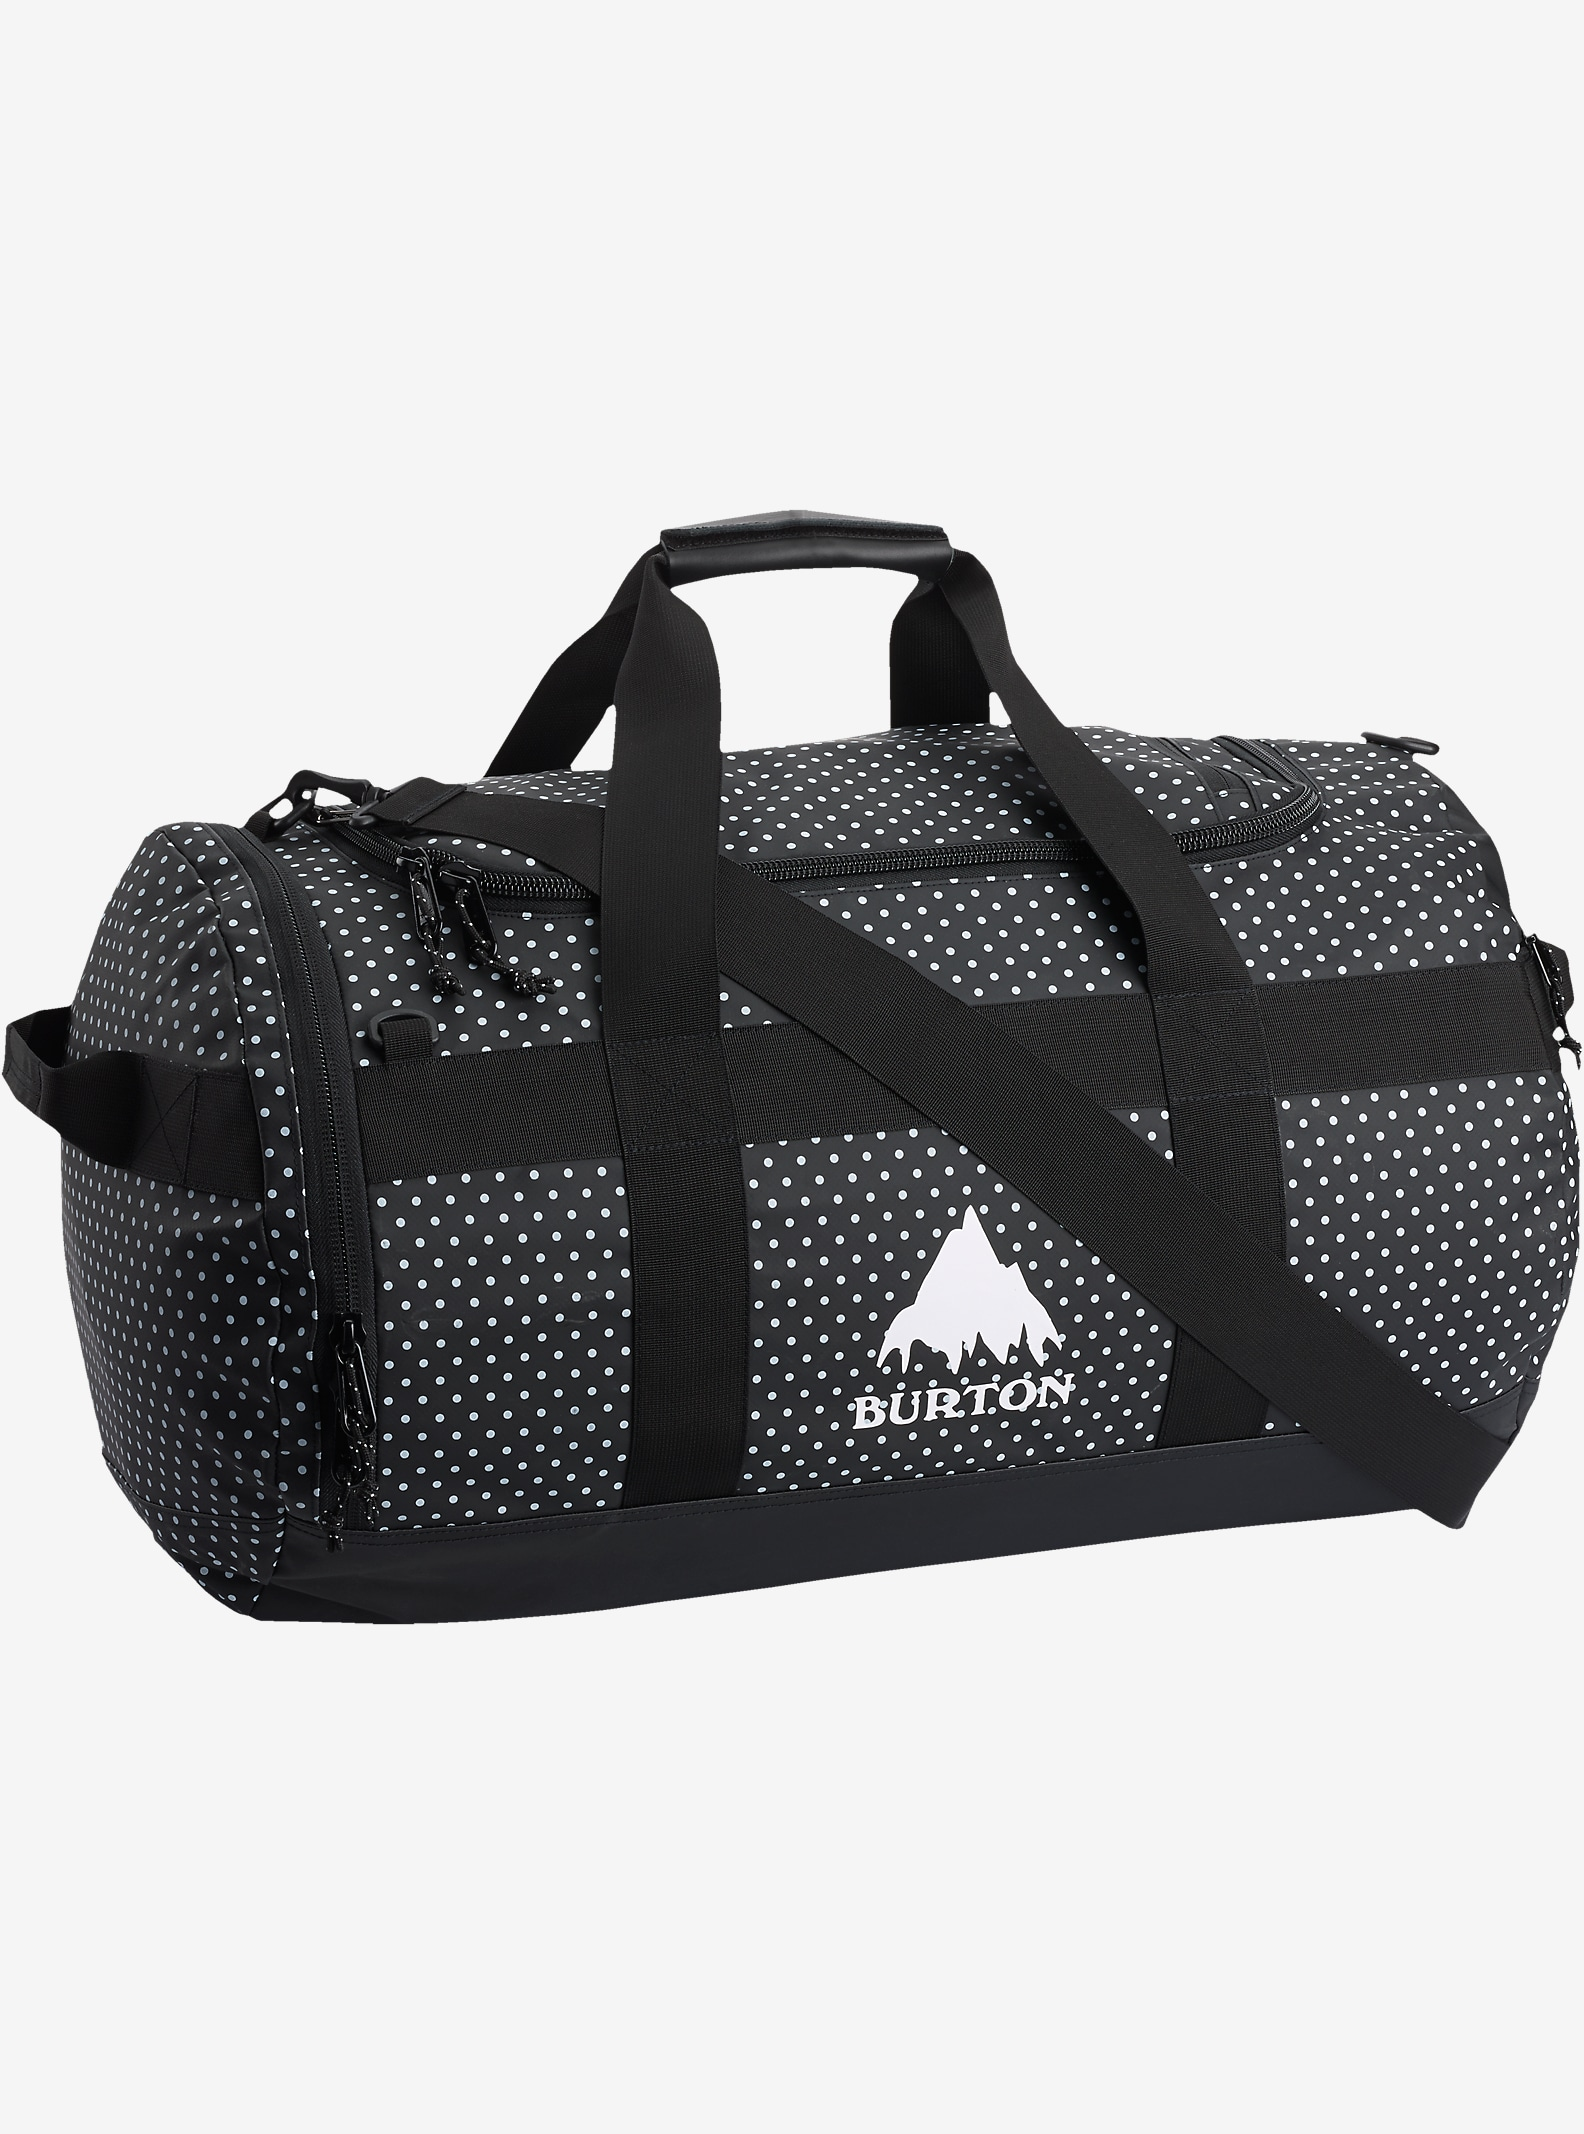 Burton Backhill Duffel Bag Medium 70L shown in Black Polka Dot Tarp